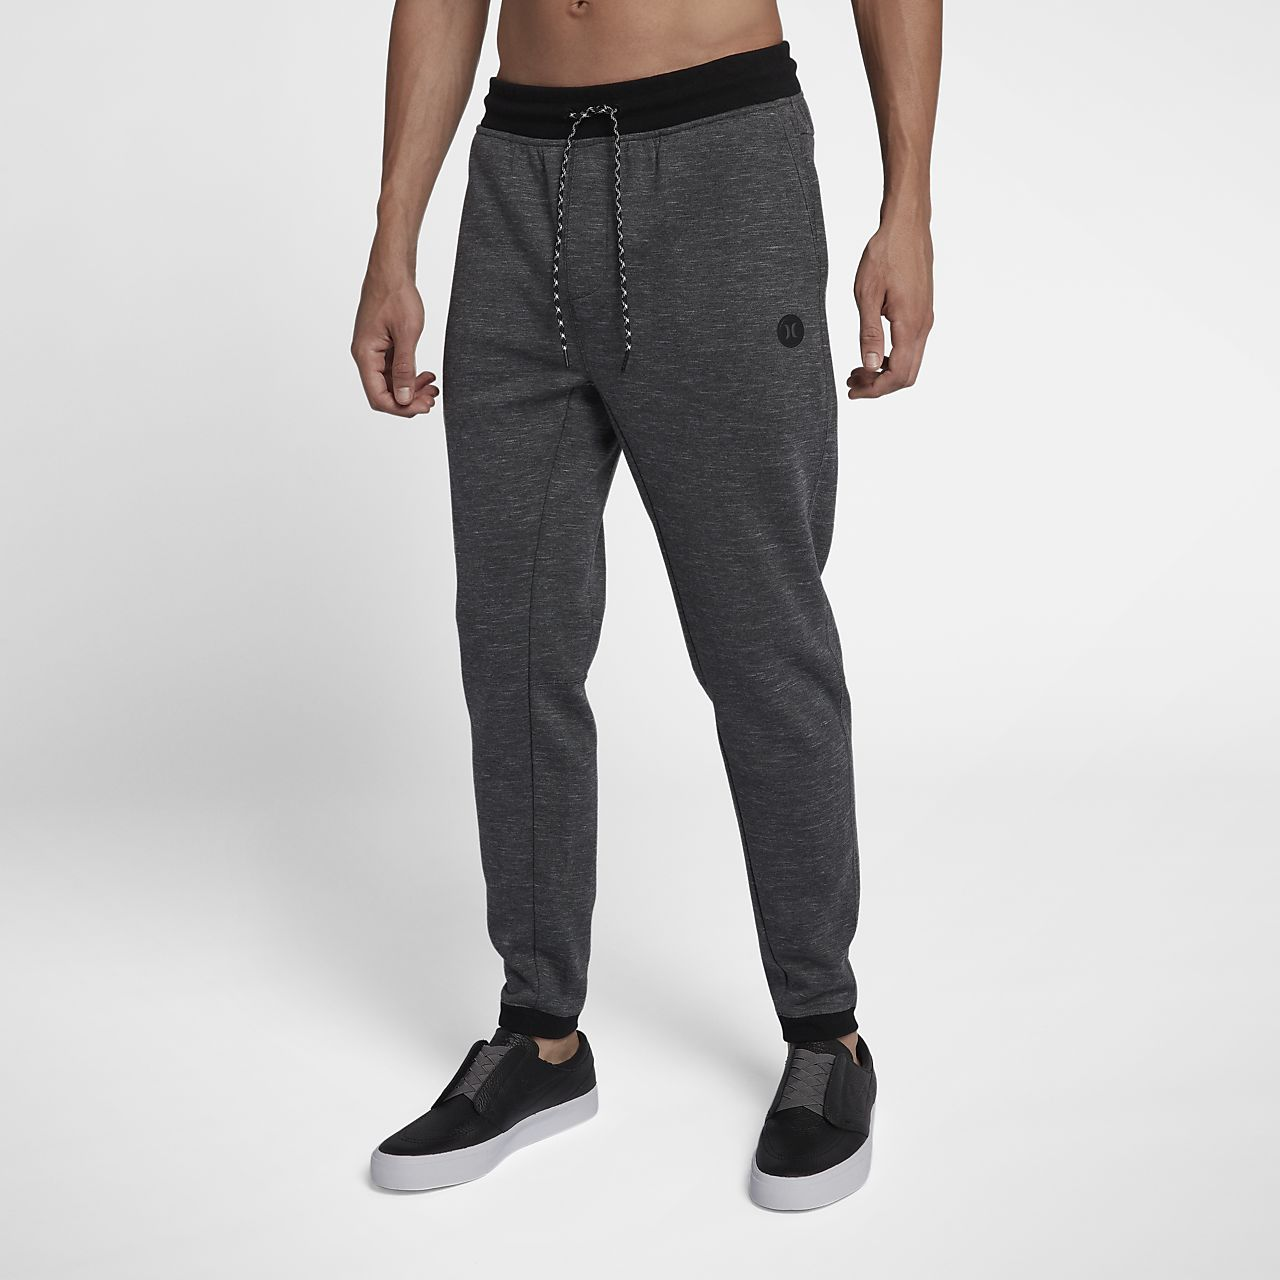 Jogging Fleece Pantalon En Phantom De Nike Homme Tissu Hurley Pour 5wwIqRvx